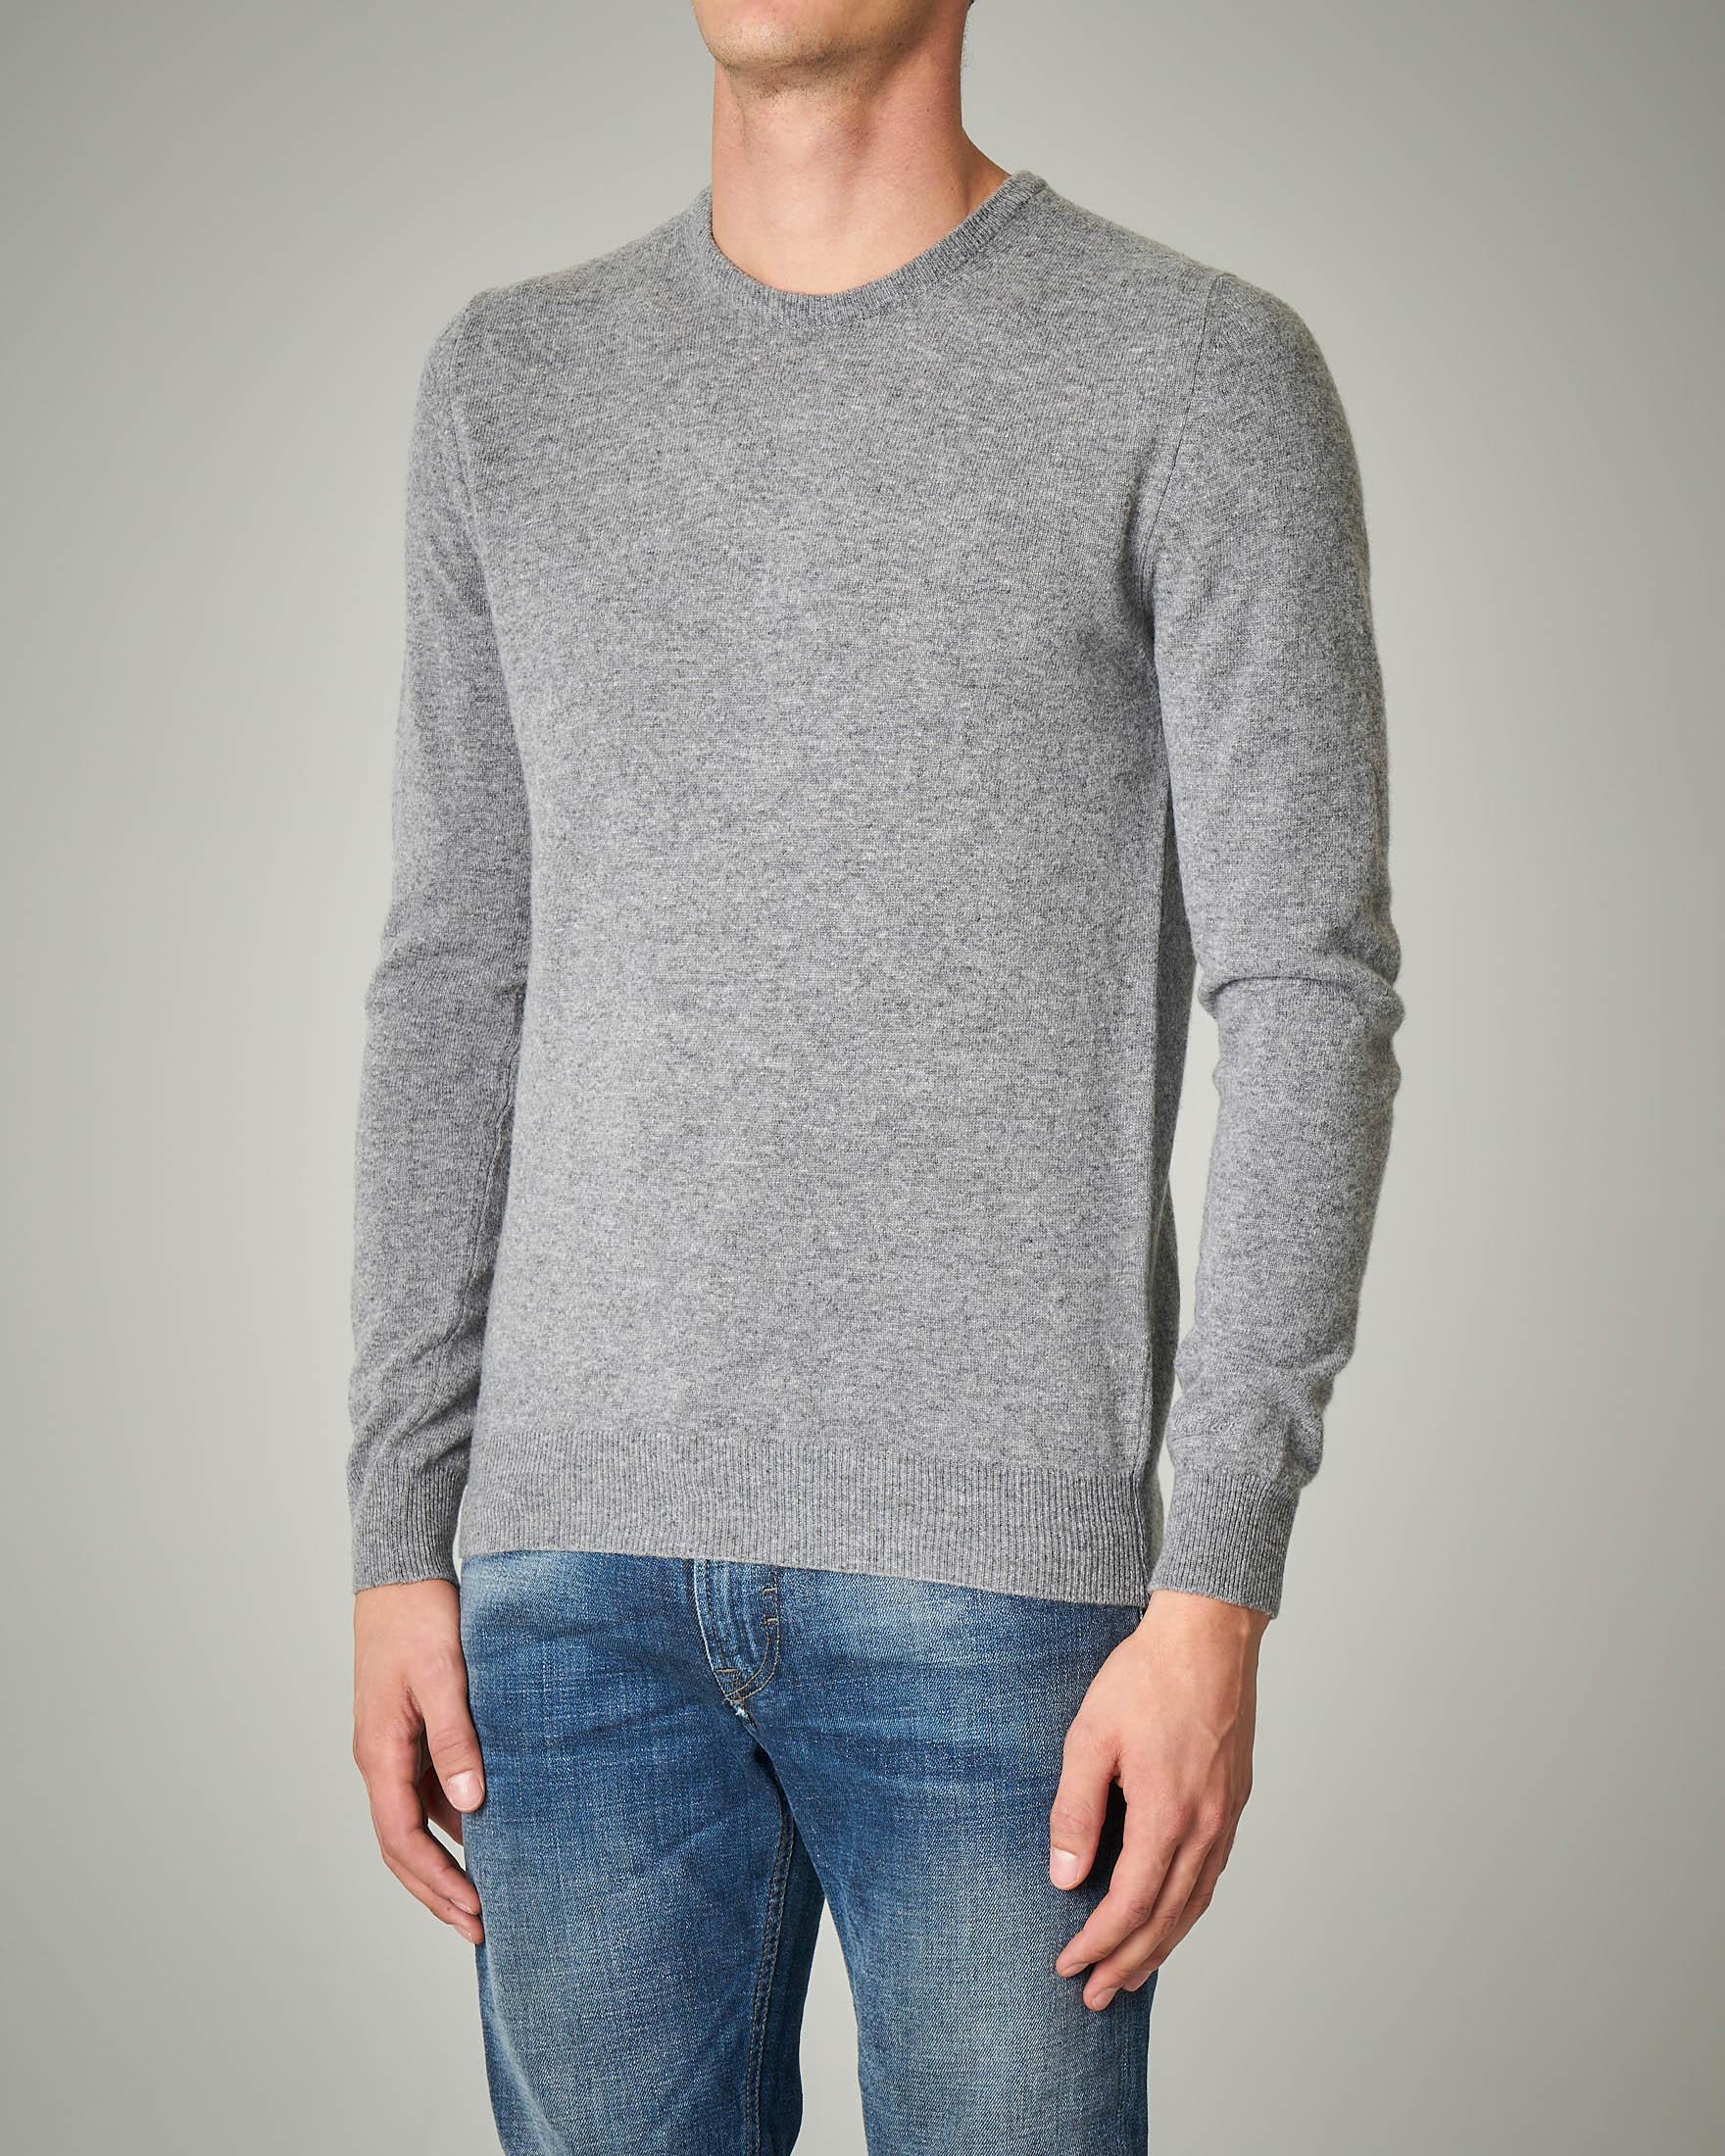 Maglia grigio melange girocollo in lana